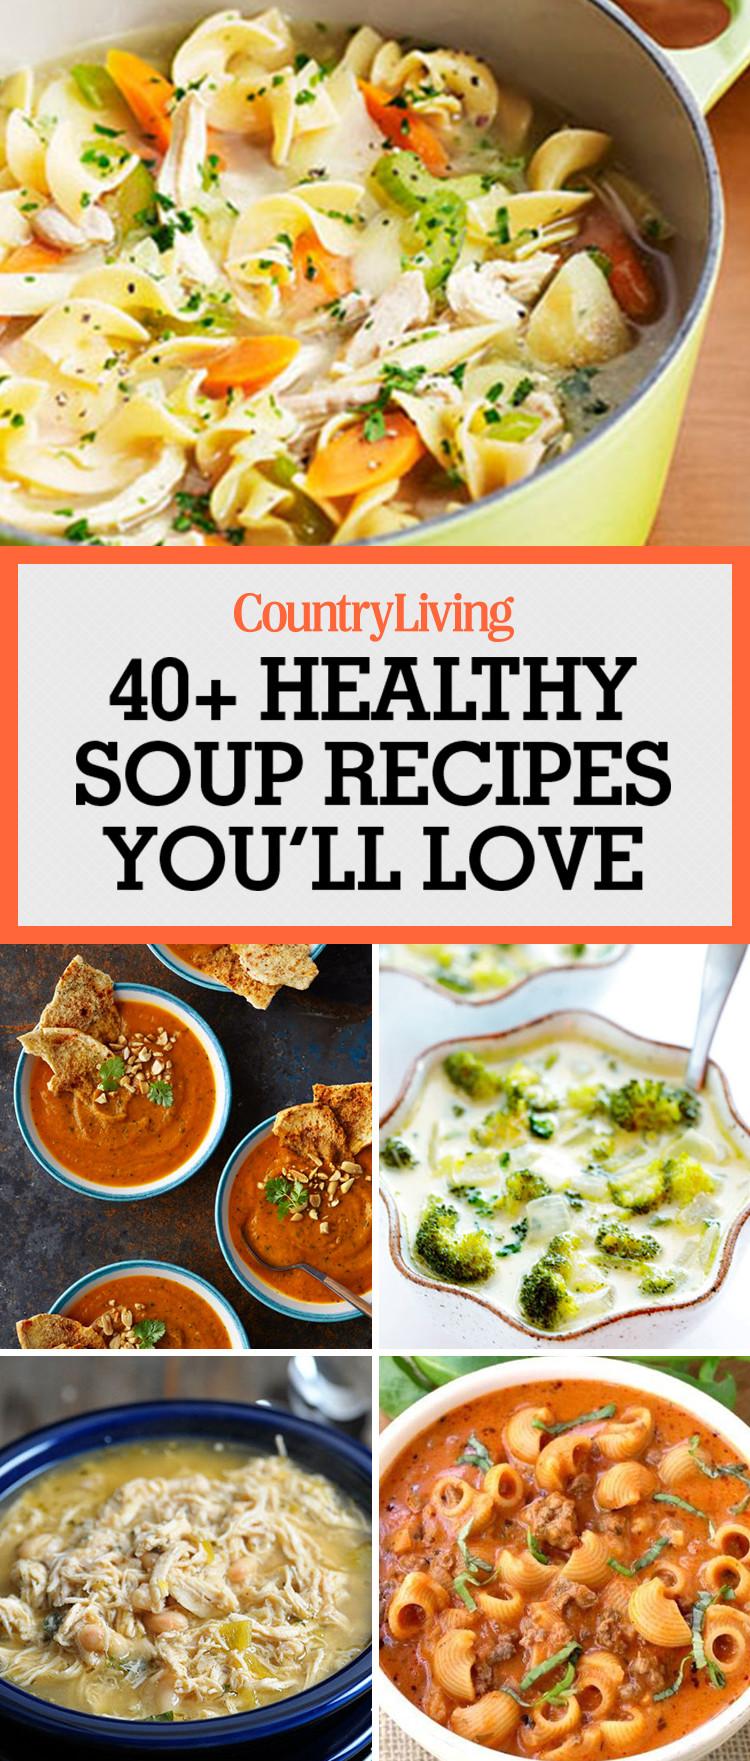 Are Soups Healthy  49 Best Healthy Soup Recipes Quick & Easy Low Calorie Soups